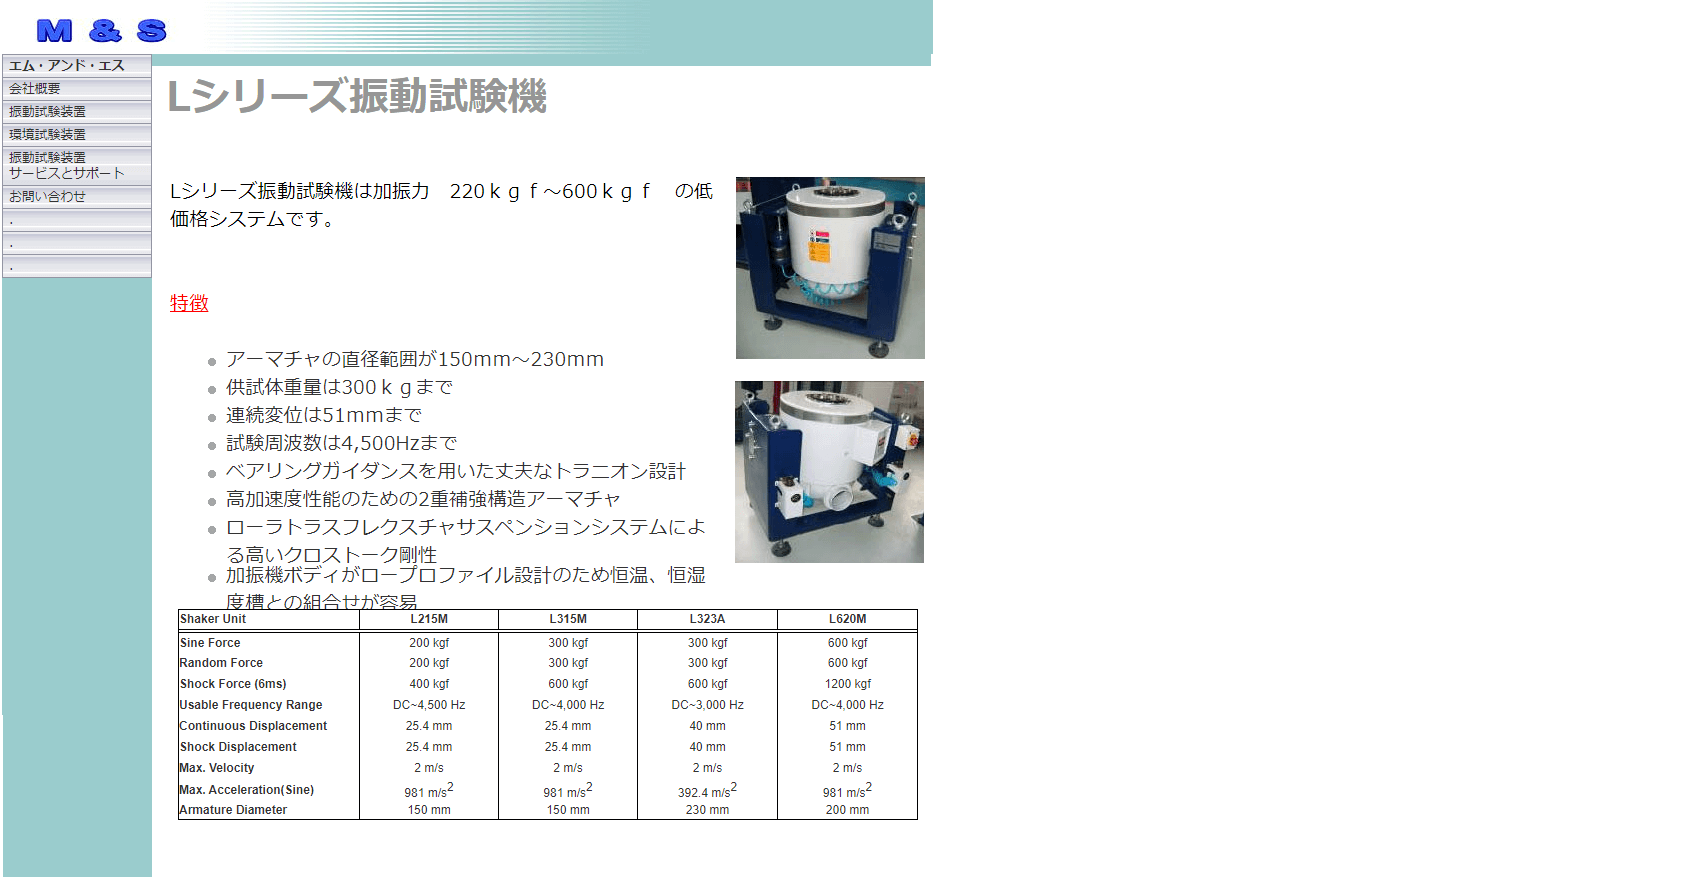 Lシリーズ振動試験機